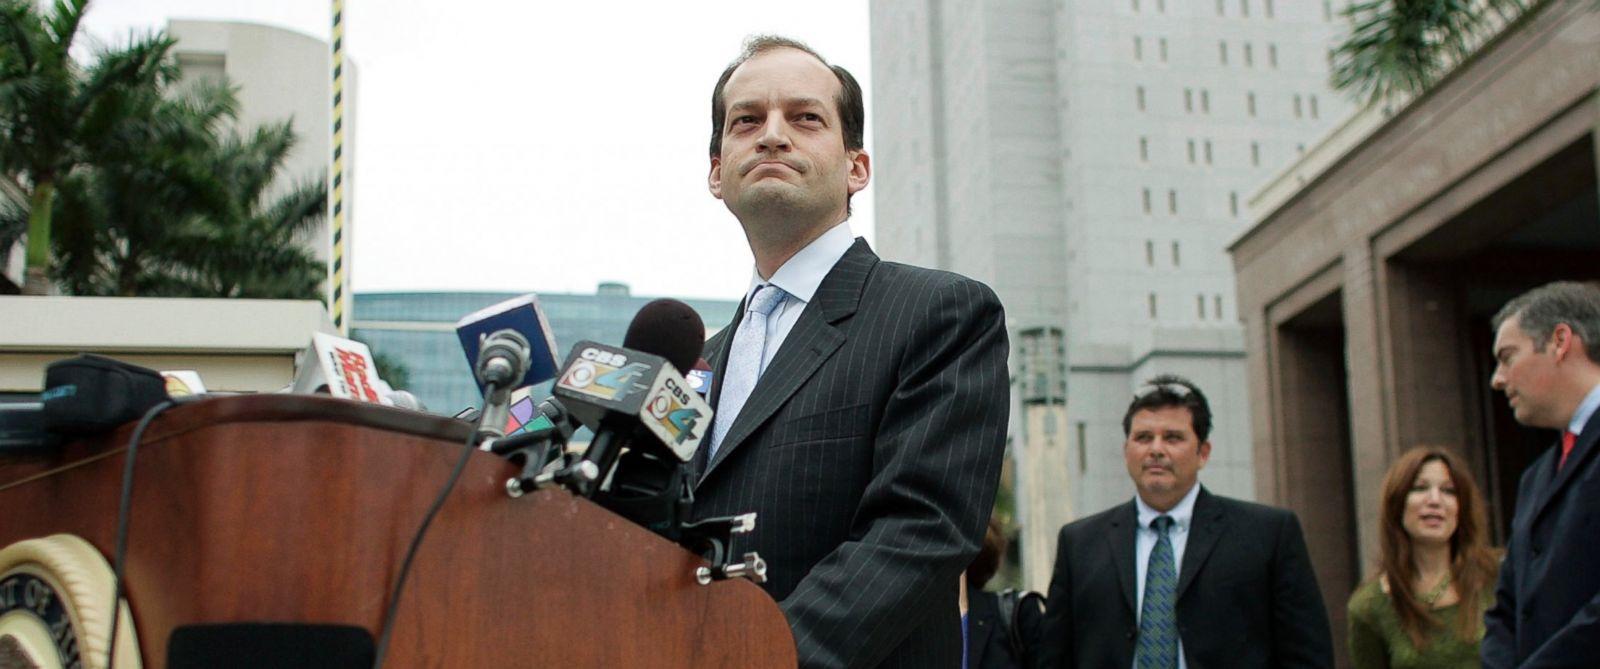 PHOTO: Alexander Acosta speaks to the media, Feb. 27, 2007, in Miami, Florida.